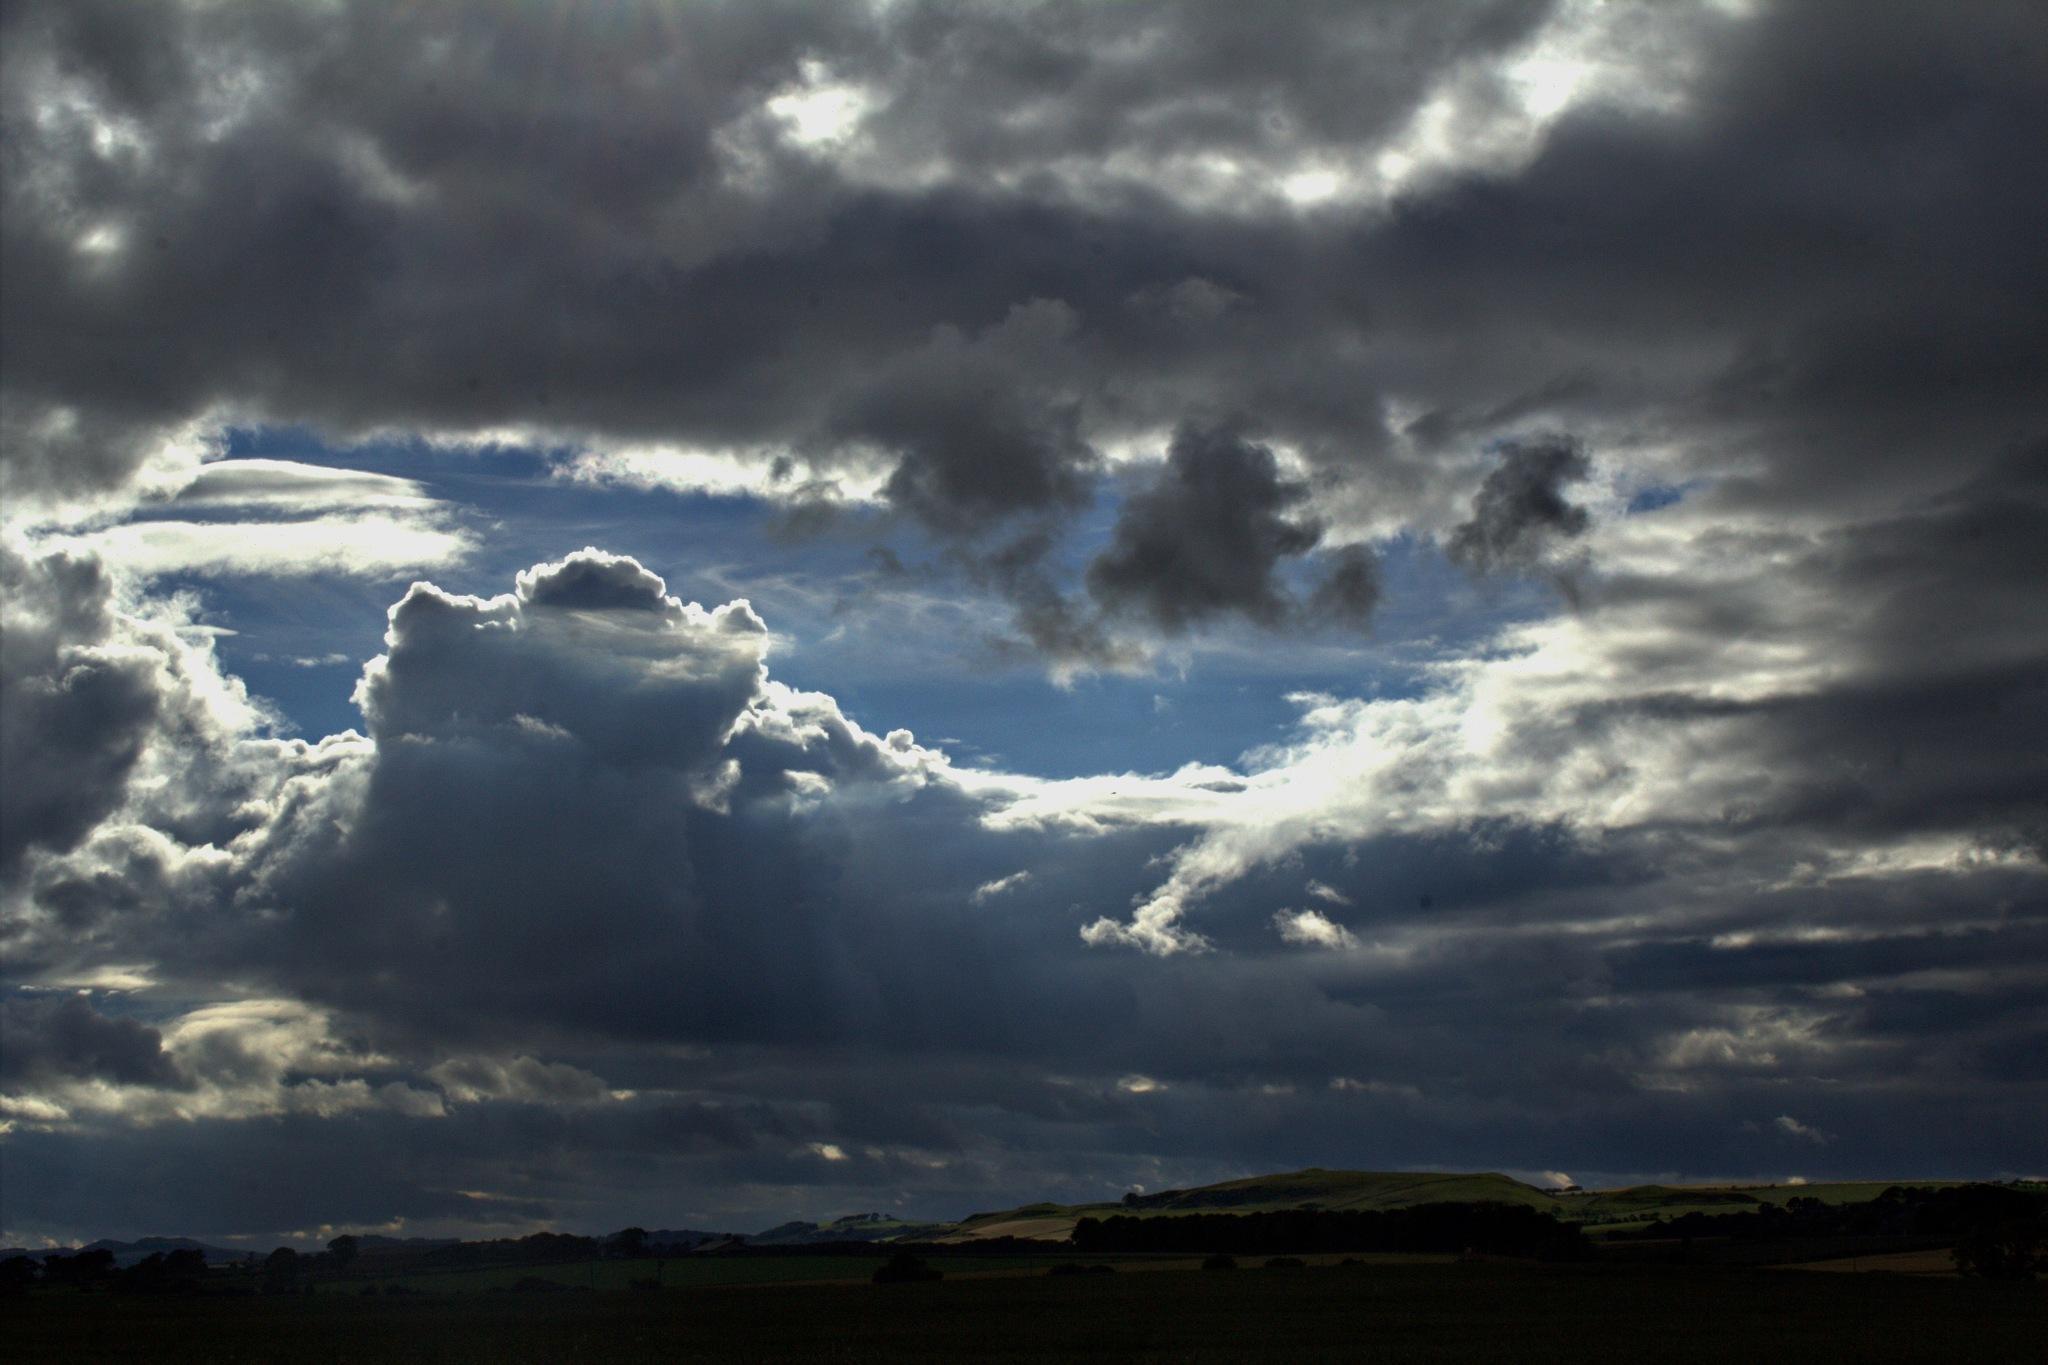 Cloud power by Rich66